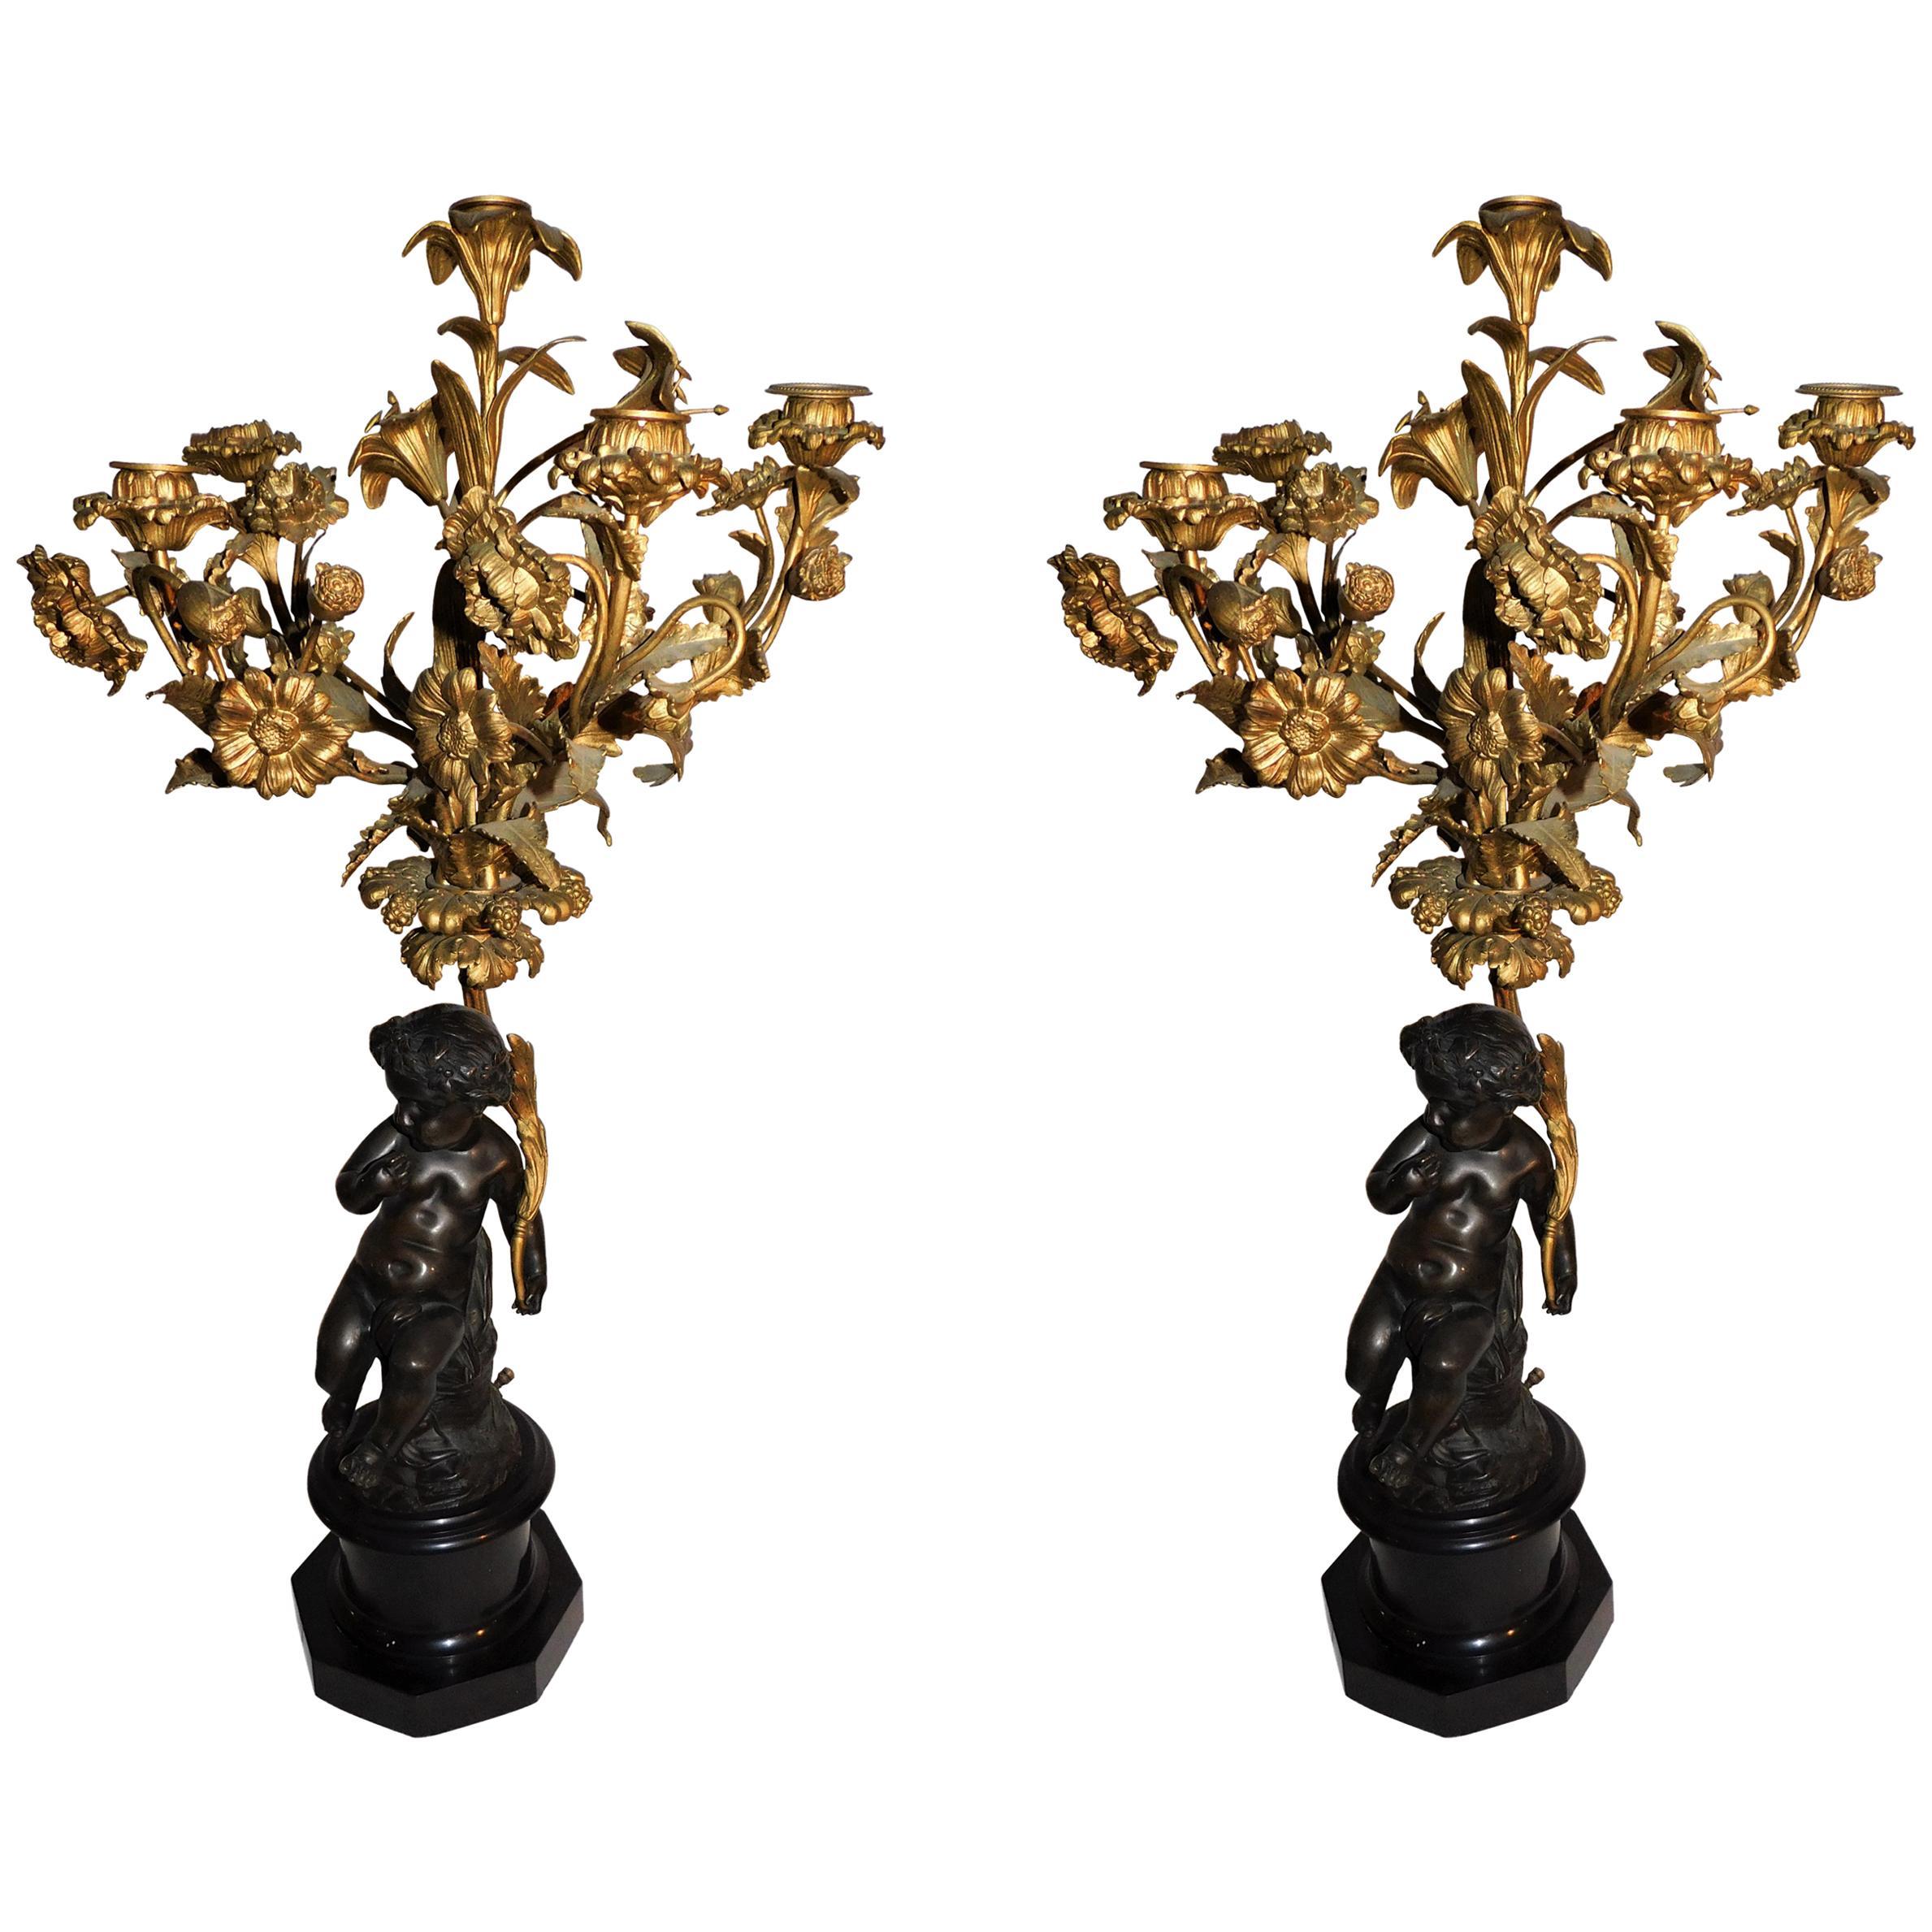 Pair of 19th Century French Gold Gilded Bronze Putti Cherubs Candelabras